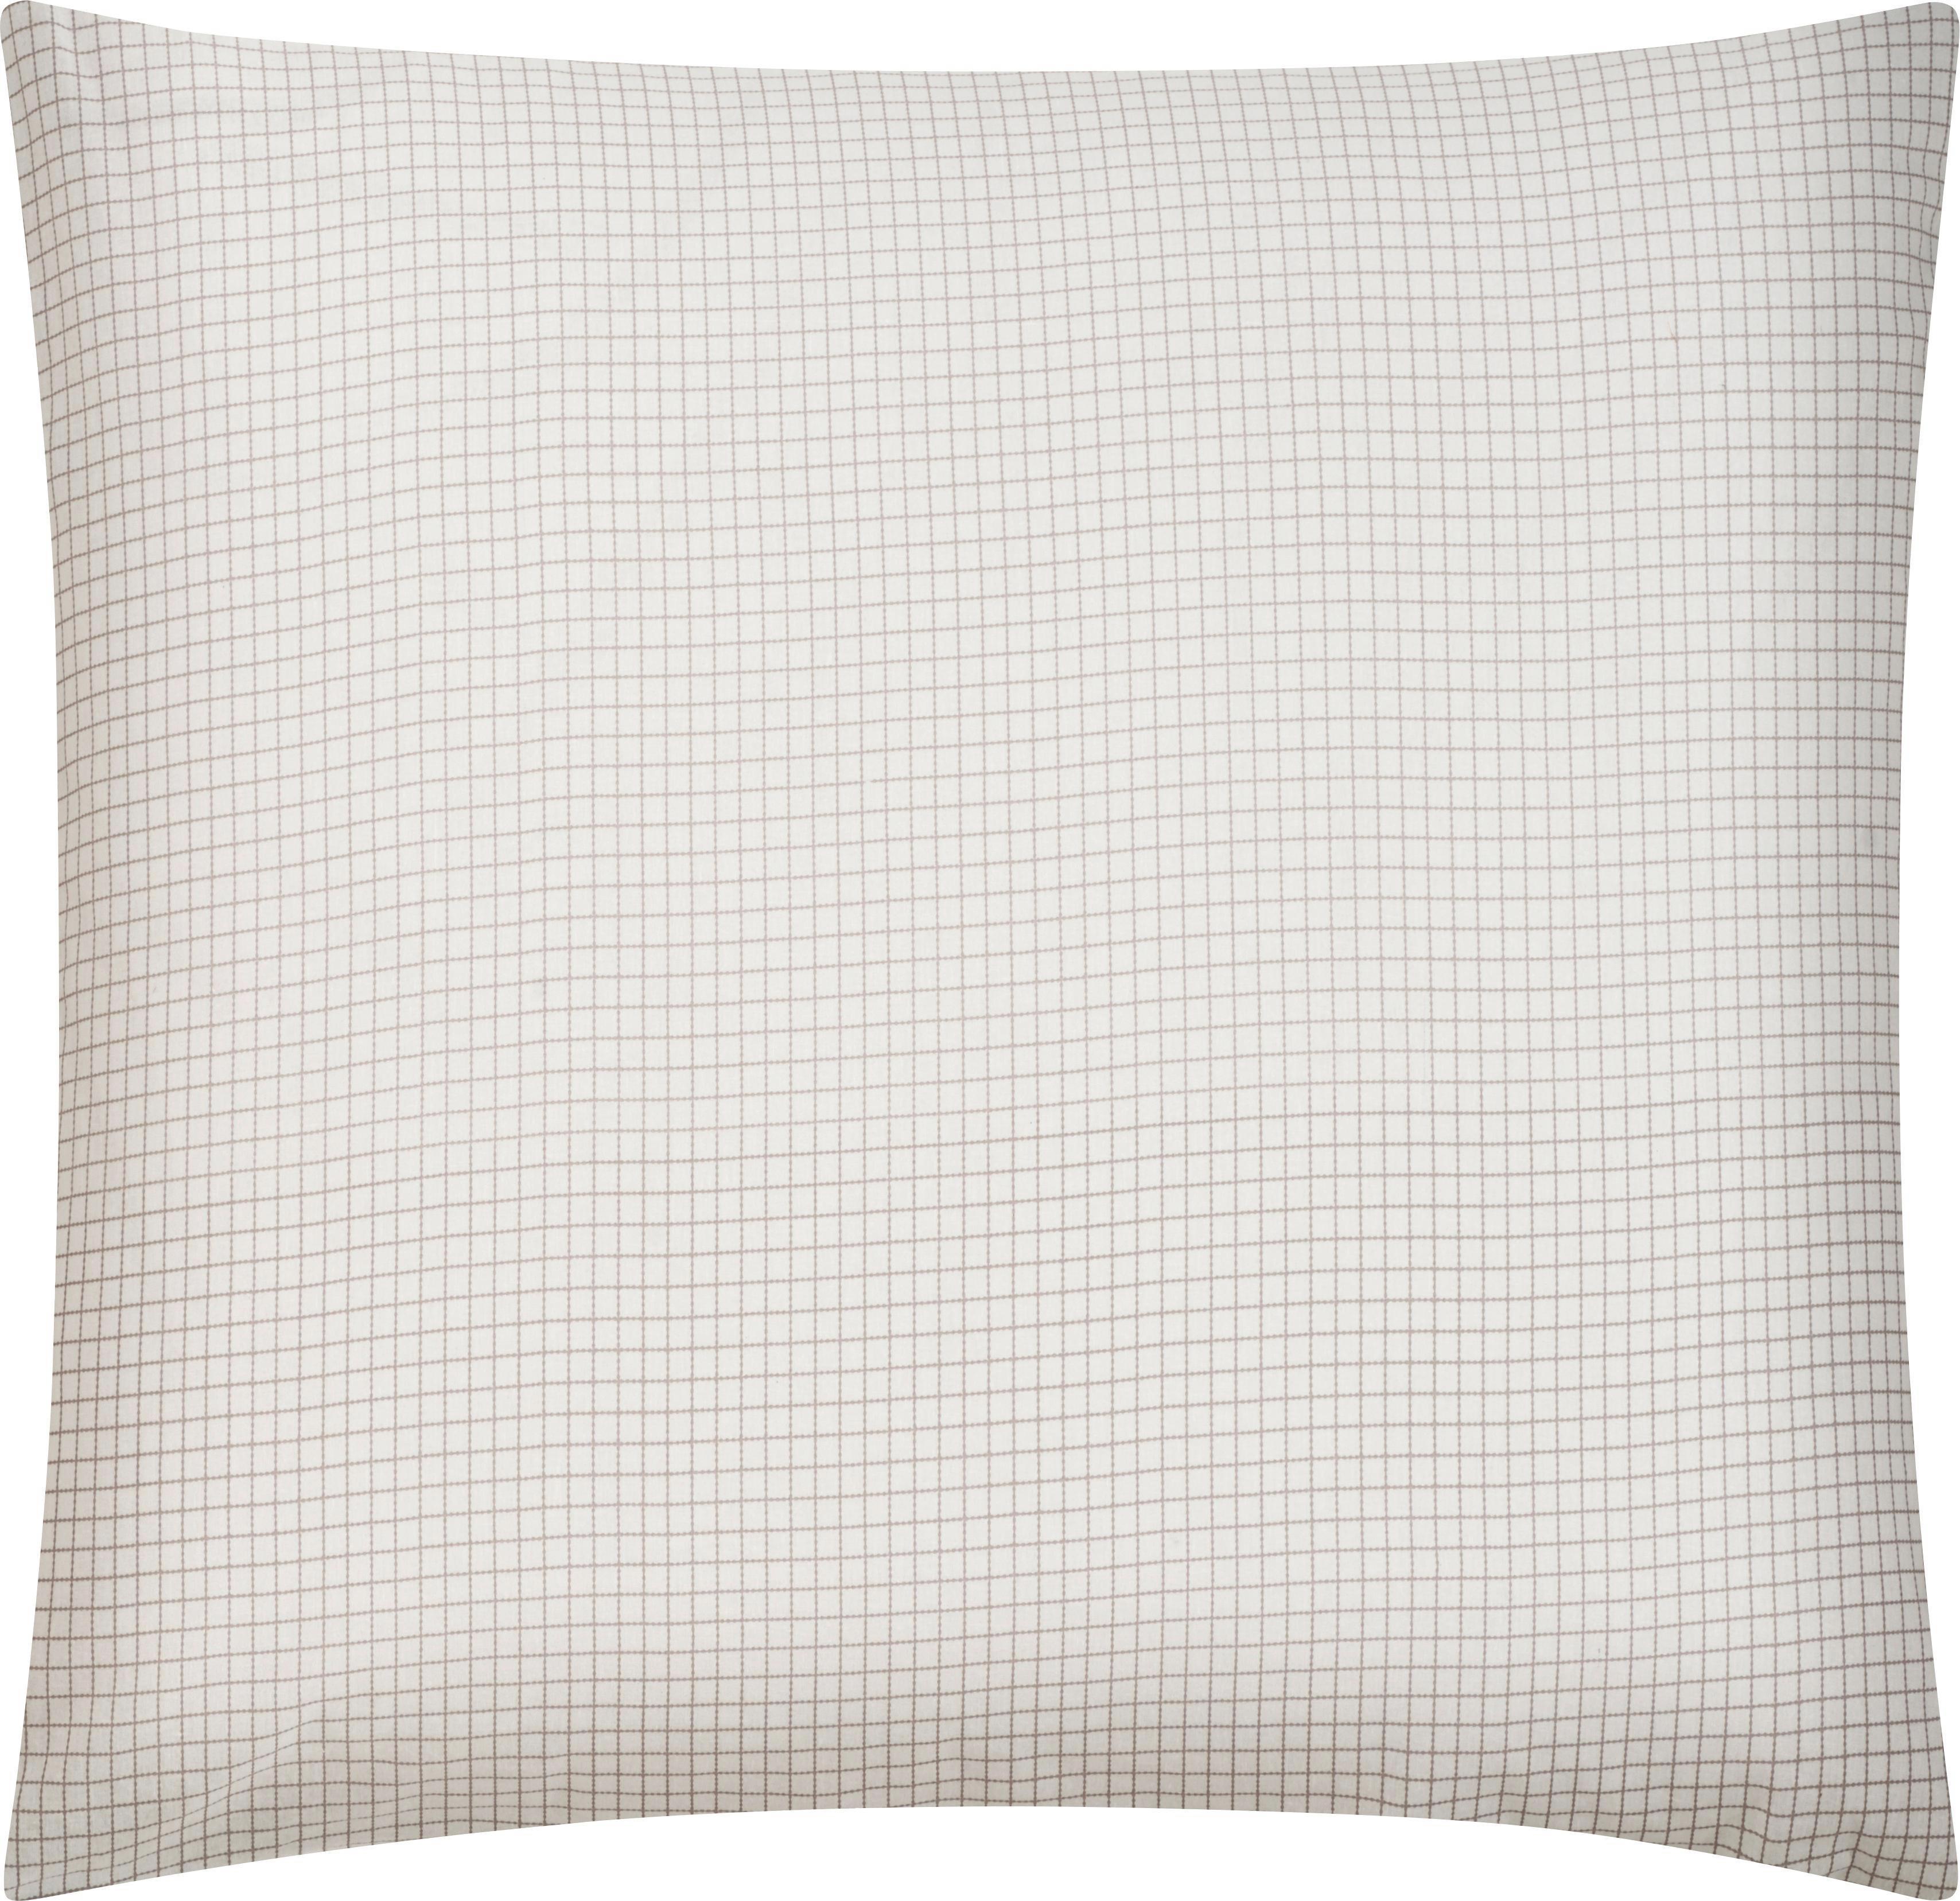 Bettwäsche Denise Wende ca. 135x200cm - Rosa, ROMANTIK / LANDHAUS, Textil (135/200cm) - MÖMAX modern living